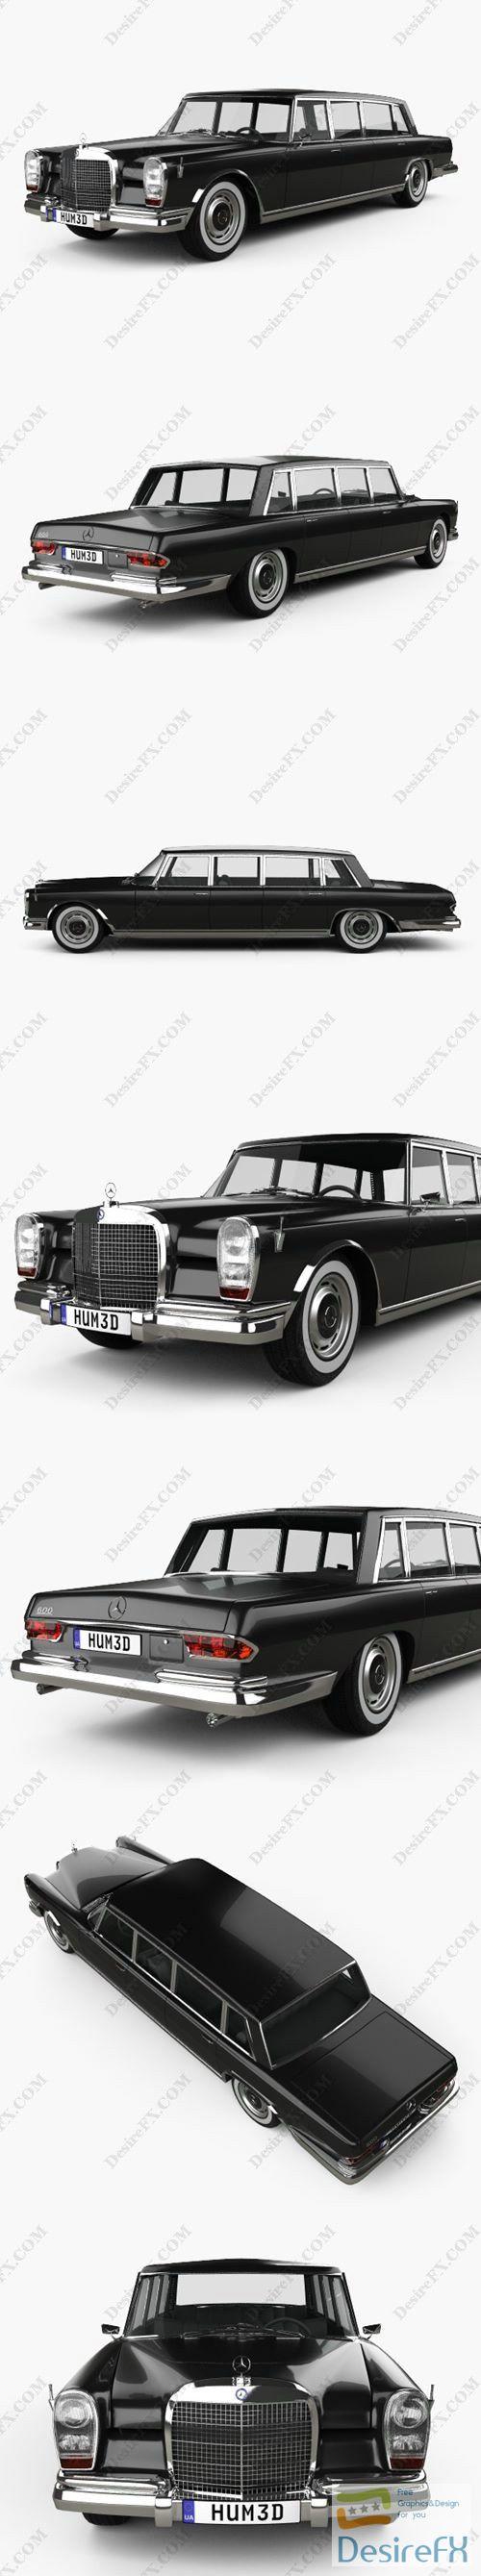 Mercedes-Benz 600 W100 Pullman 1964 3D Model